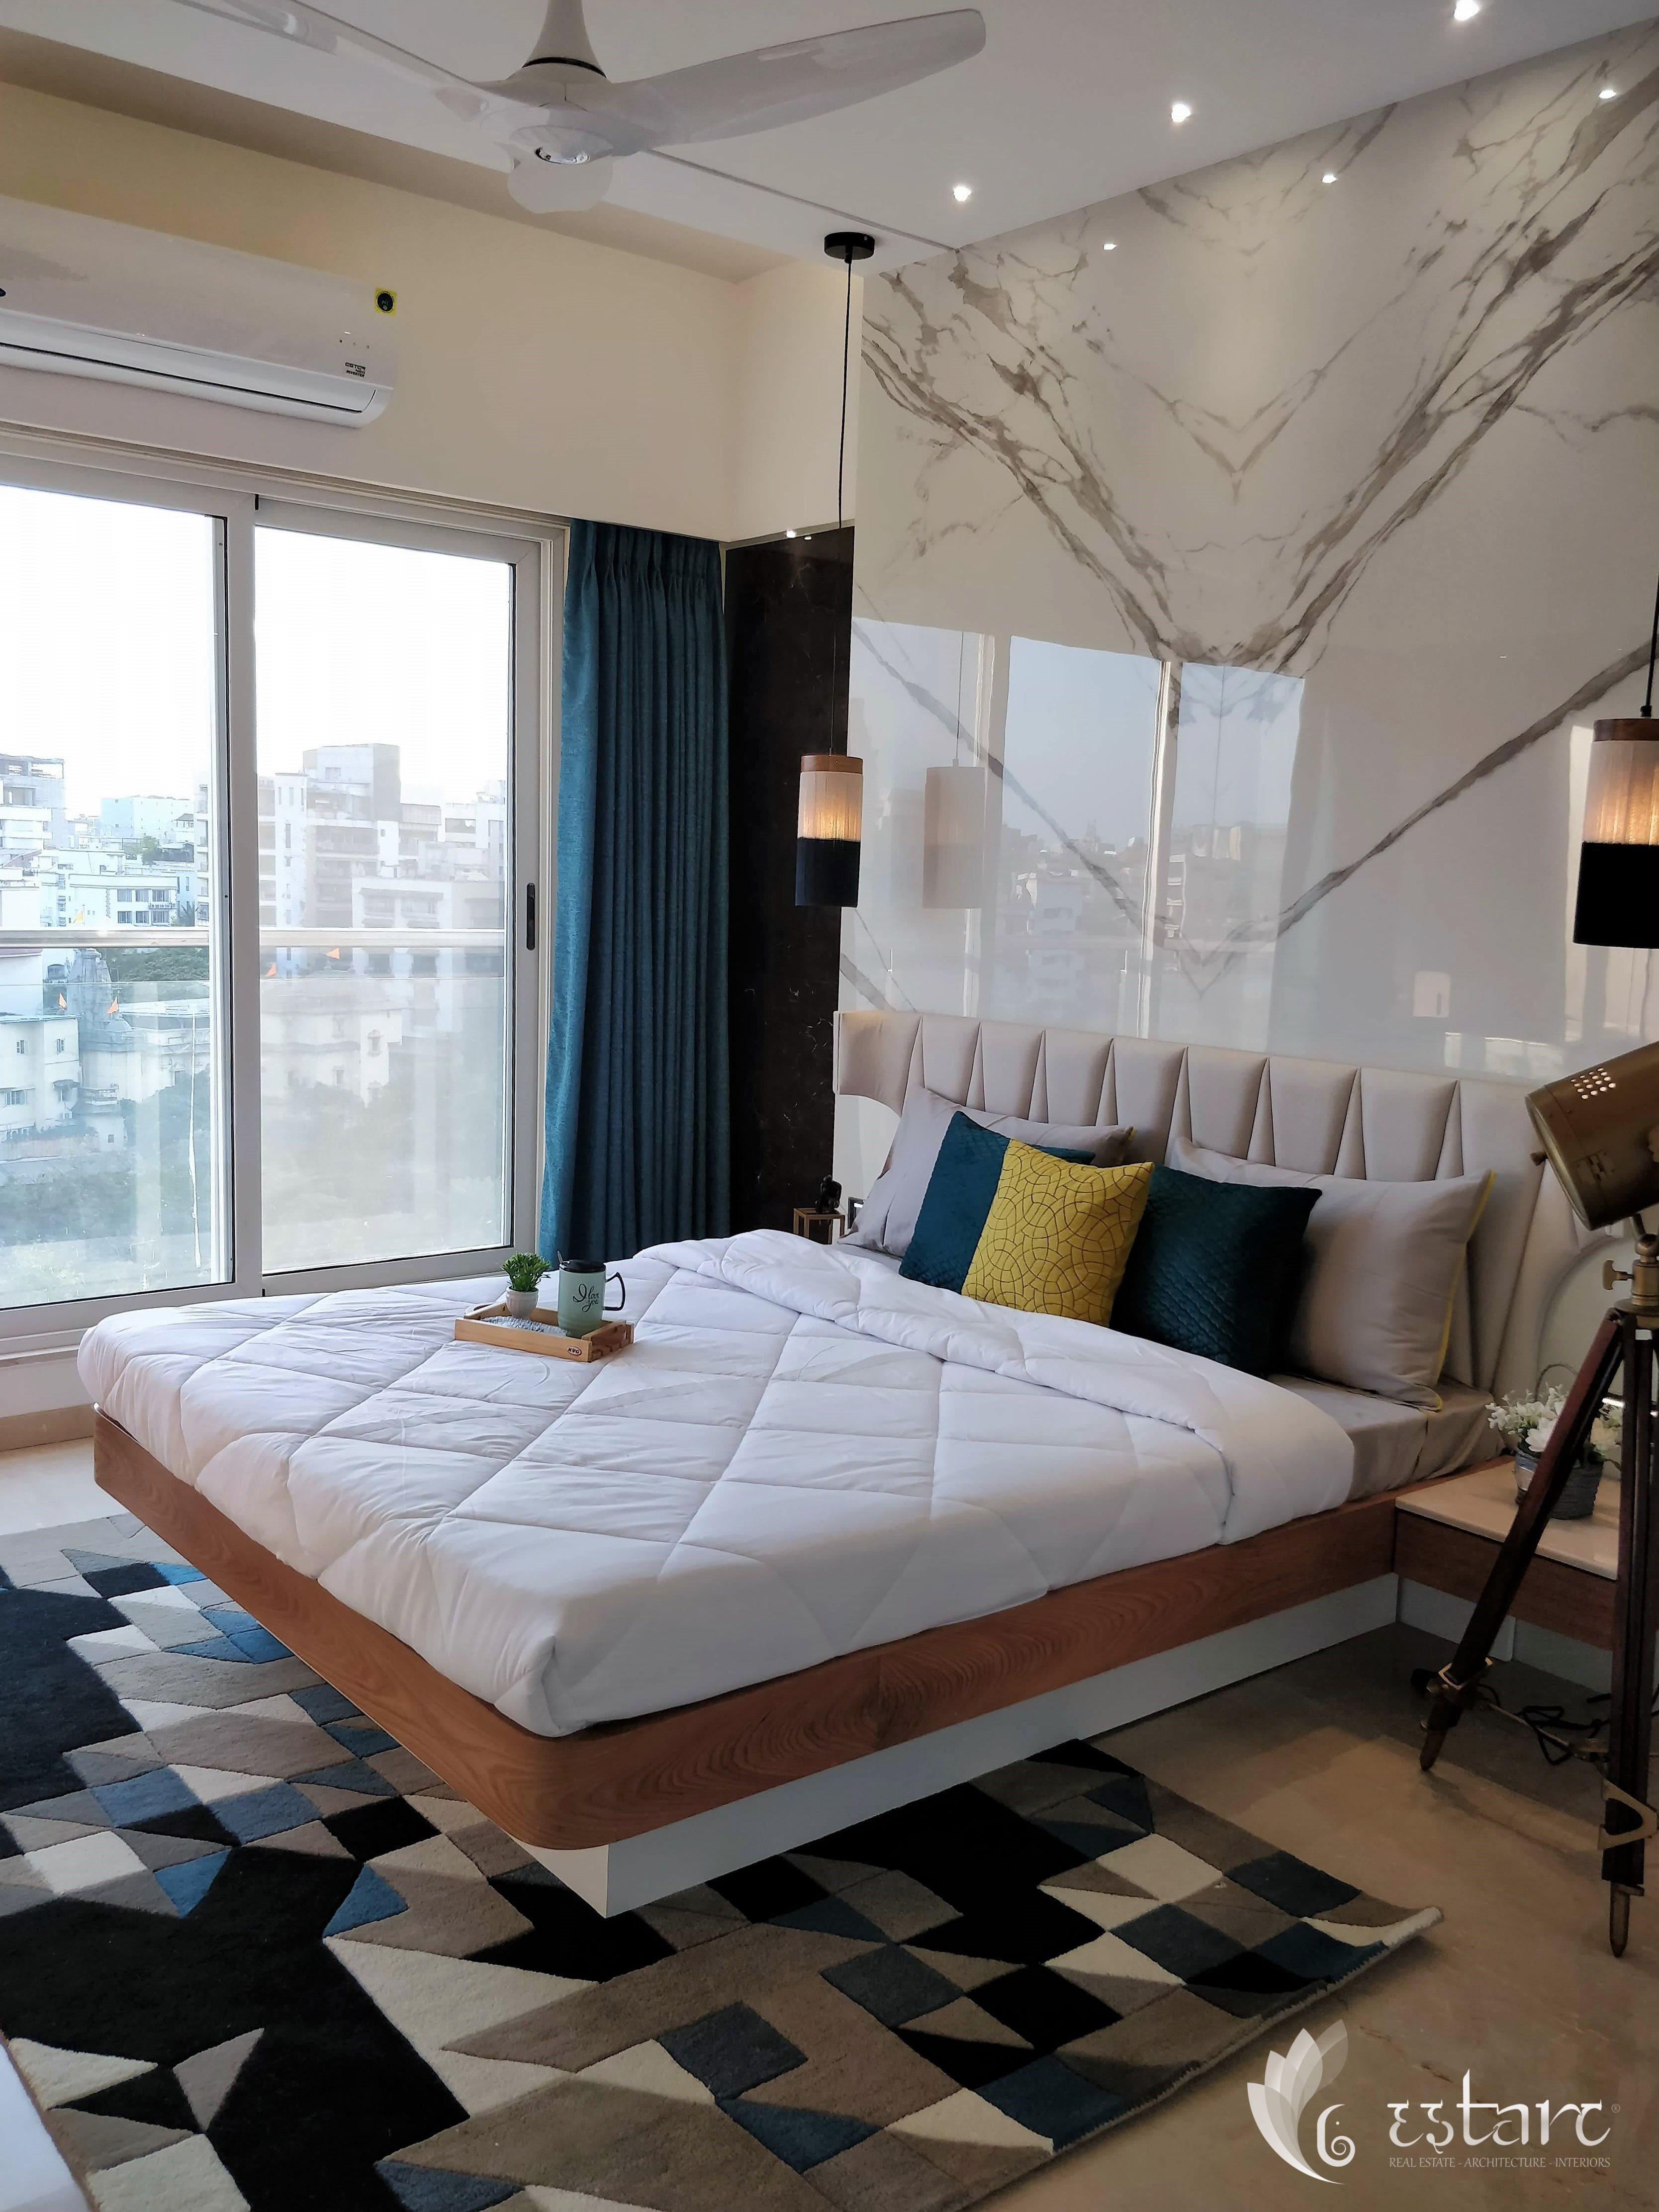 Bedroom - Sukh Shanti, Juhu